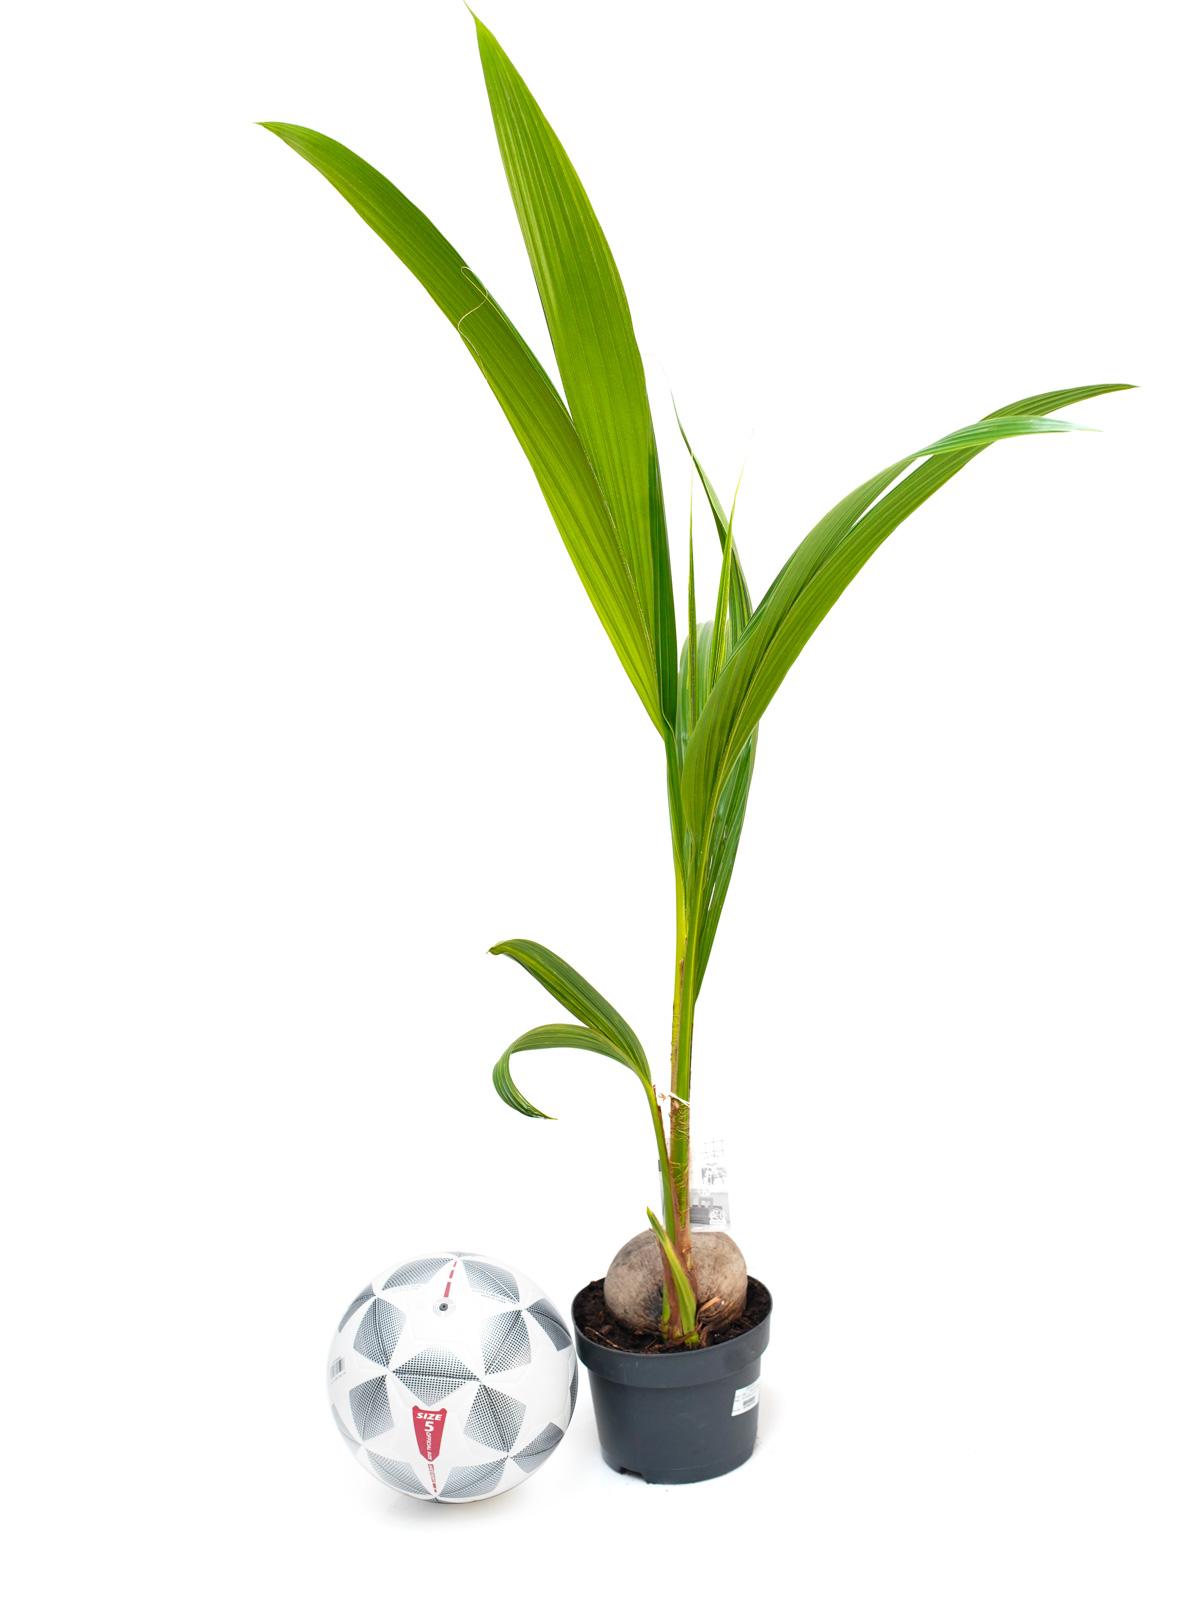 نخيل كوكوس نوسيفيرا نباتات داخلية